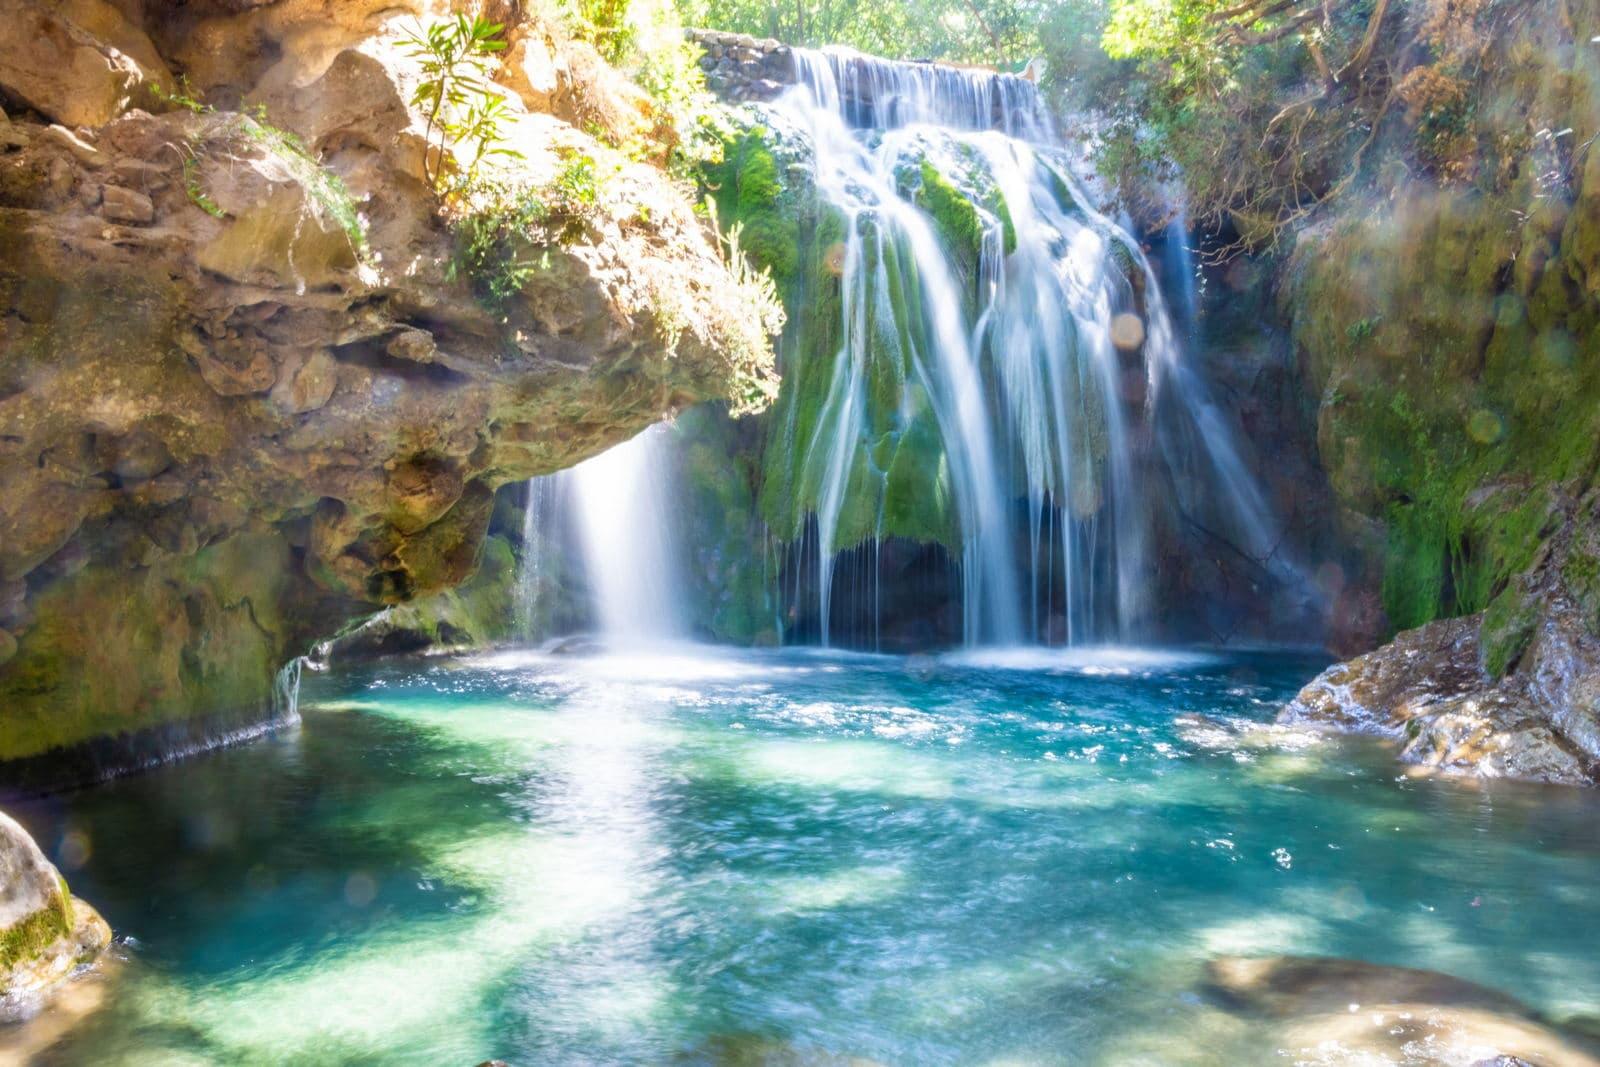 Parques nacionales de Marruecos